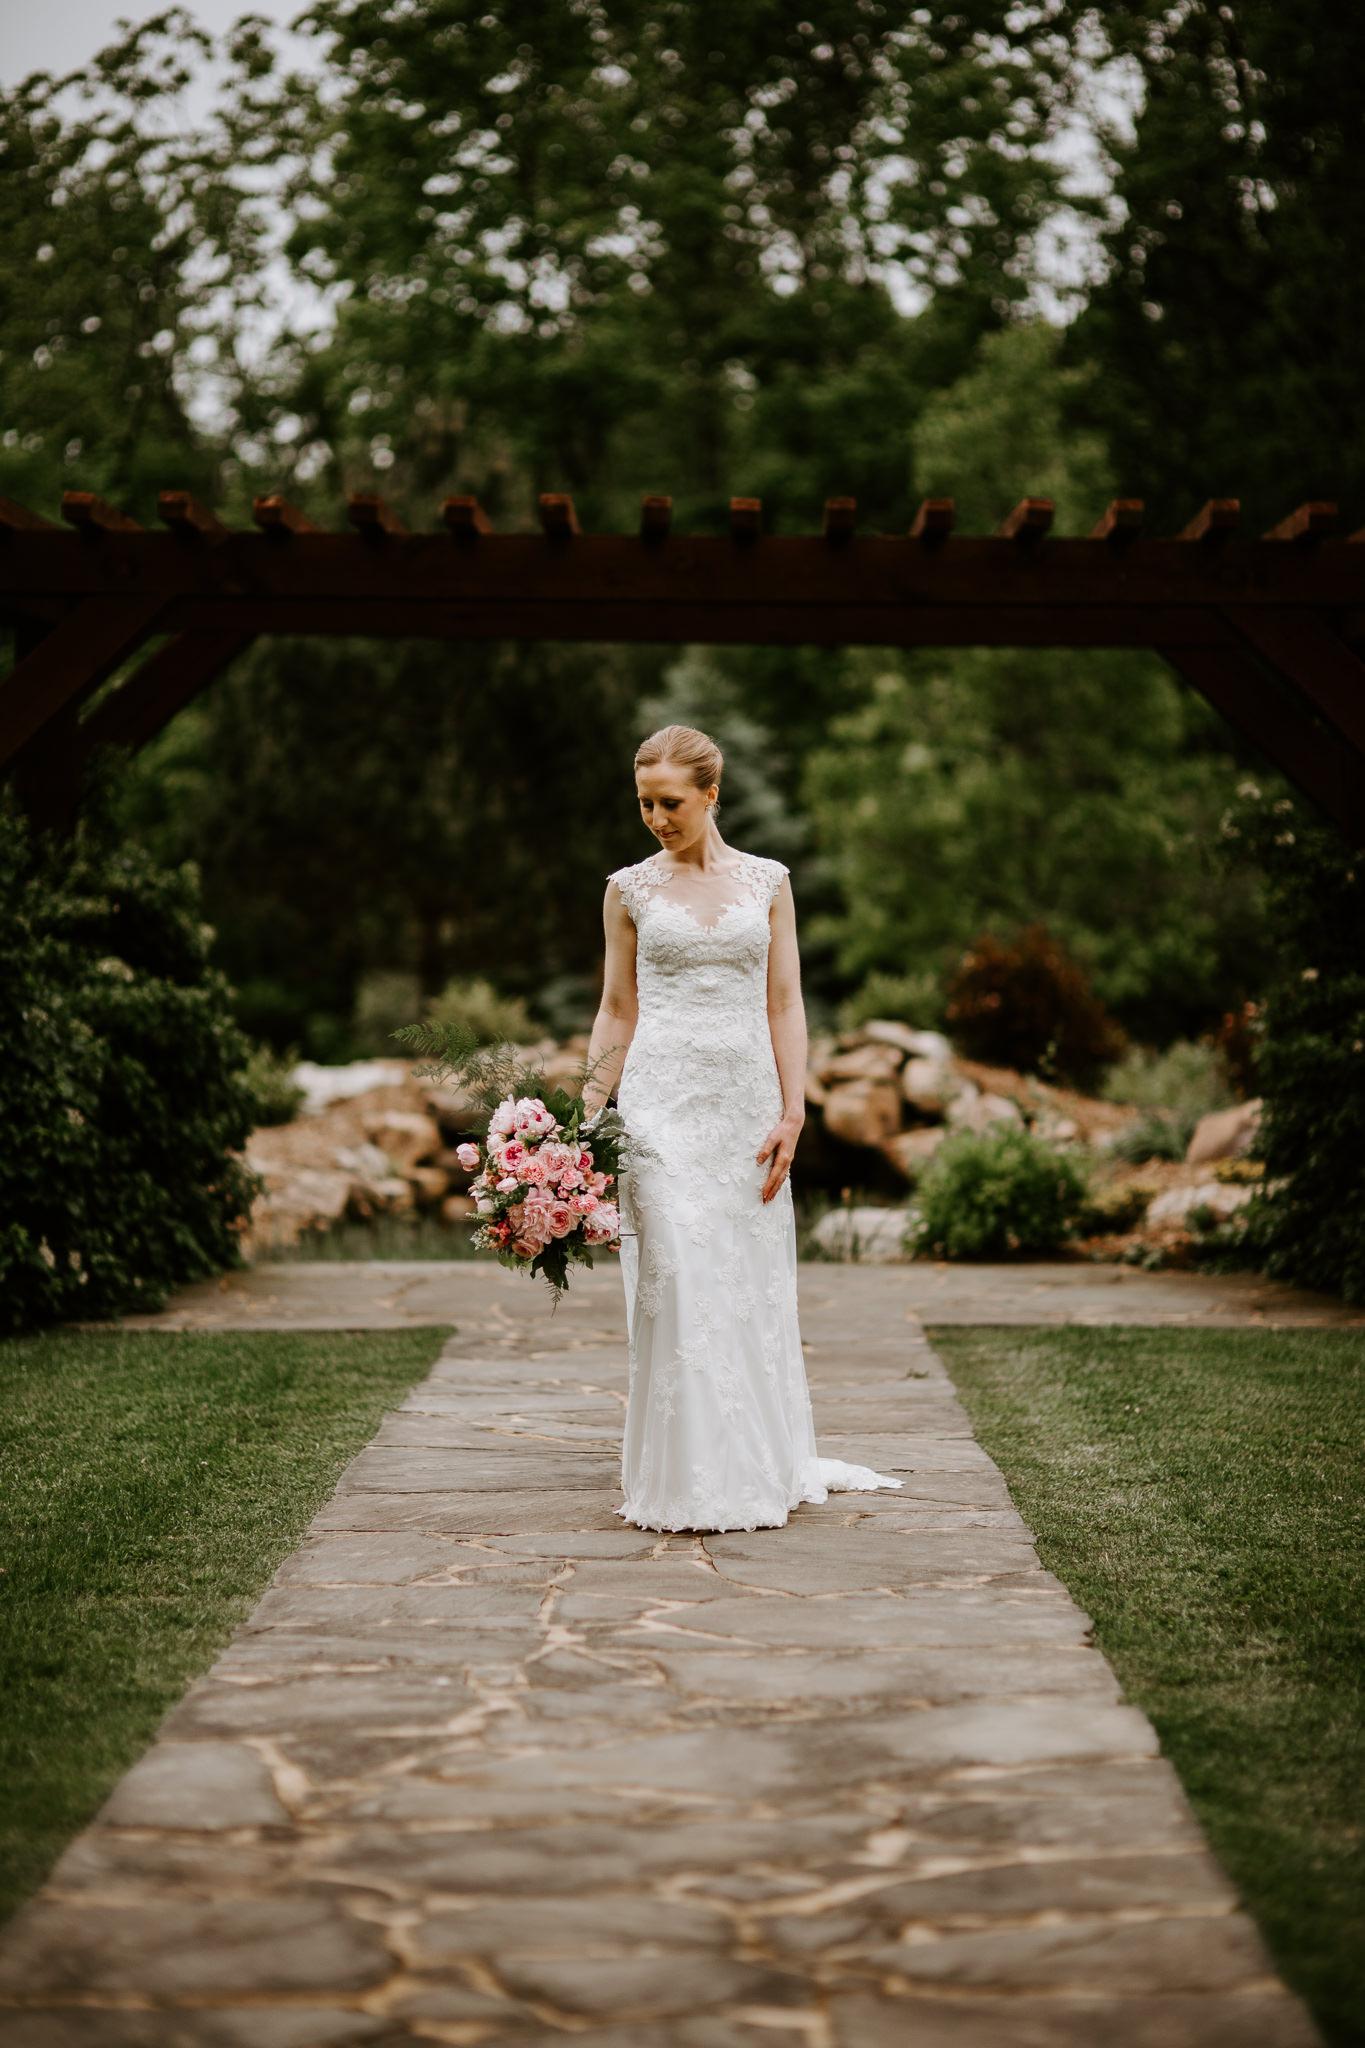 House Mountain Inn - Weddings - Lexington - Virginia - Best Wedding Photographer - Pat Cori Photography-47.jpg